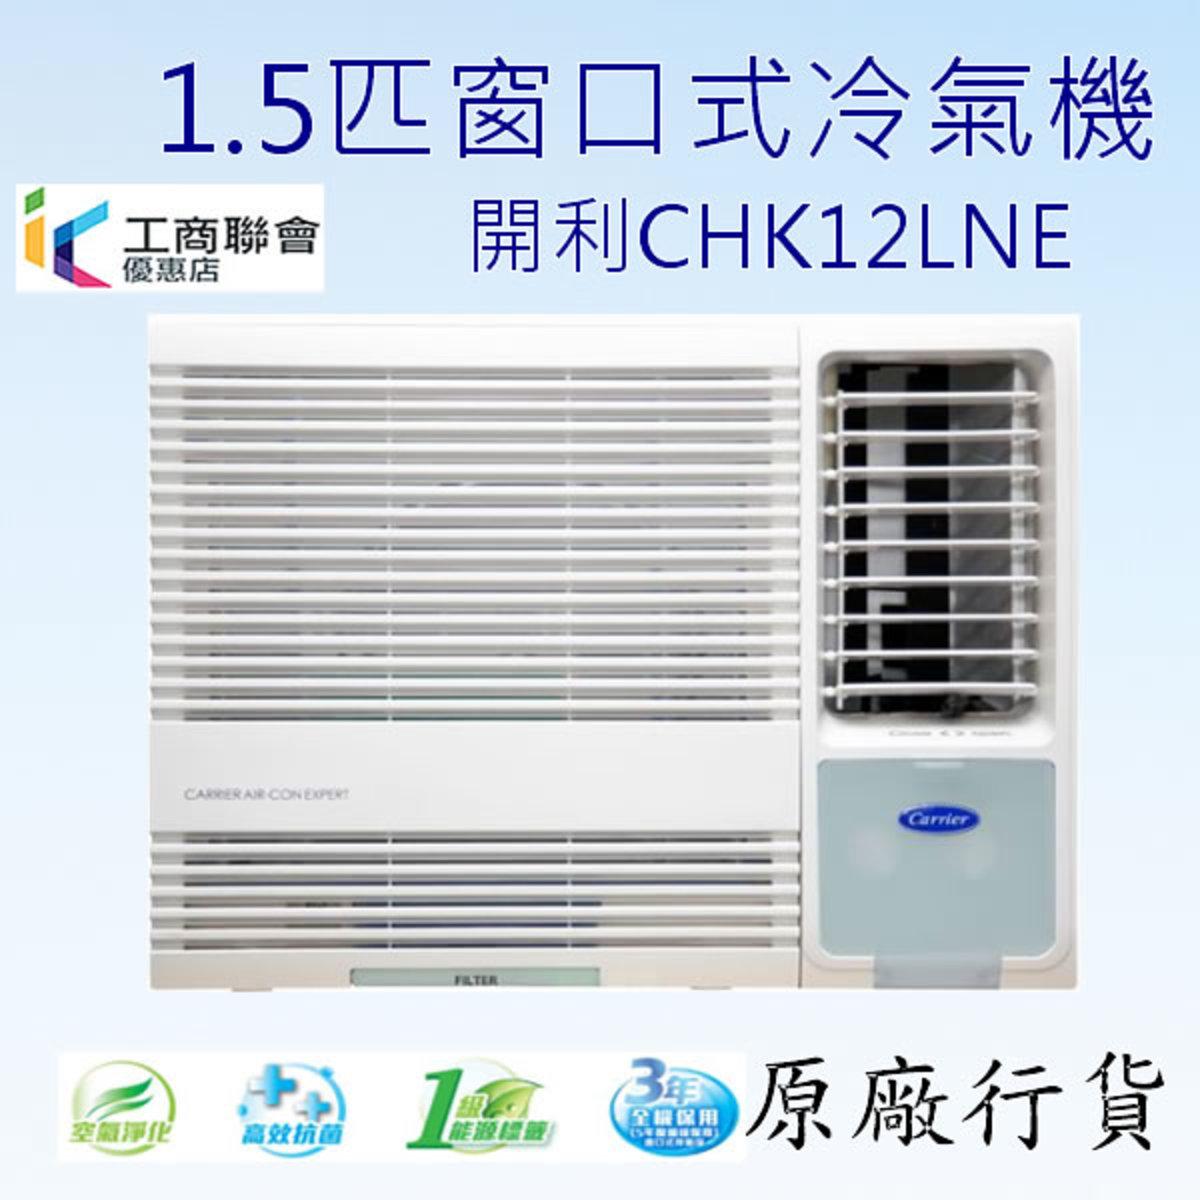 CHK12LNE 1.5匹窗口式冷氣機 (免費除舊服務)